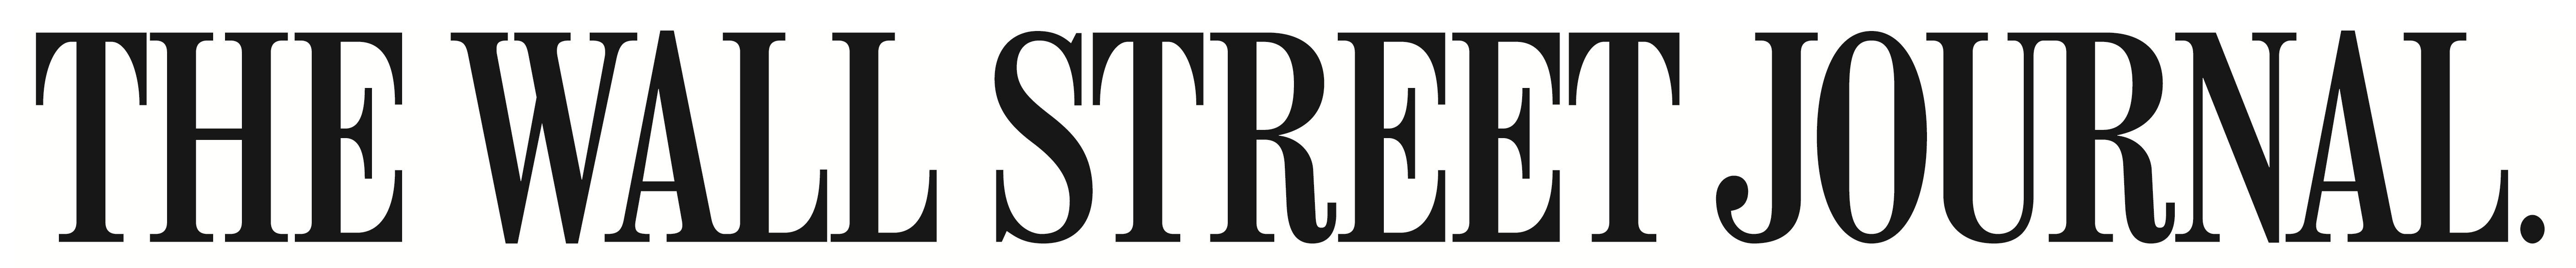 The-Wall-Street-Journal-Logo-jpg.jpg